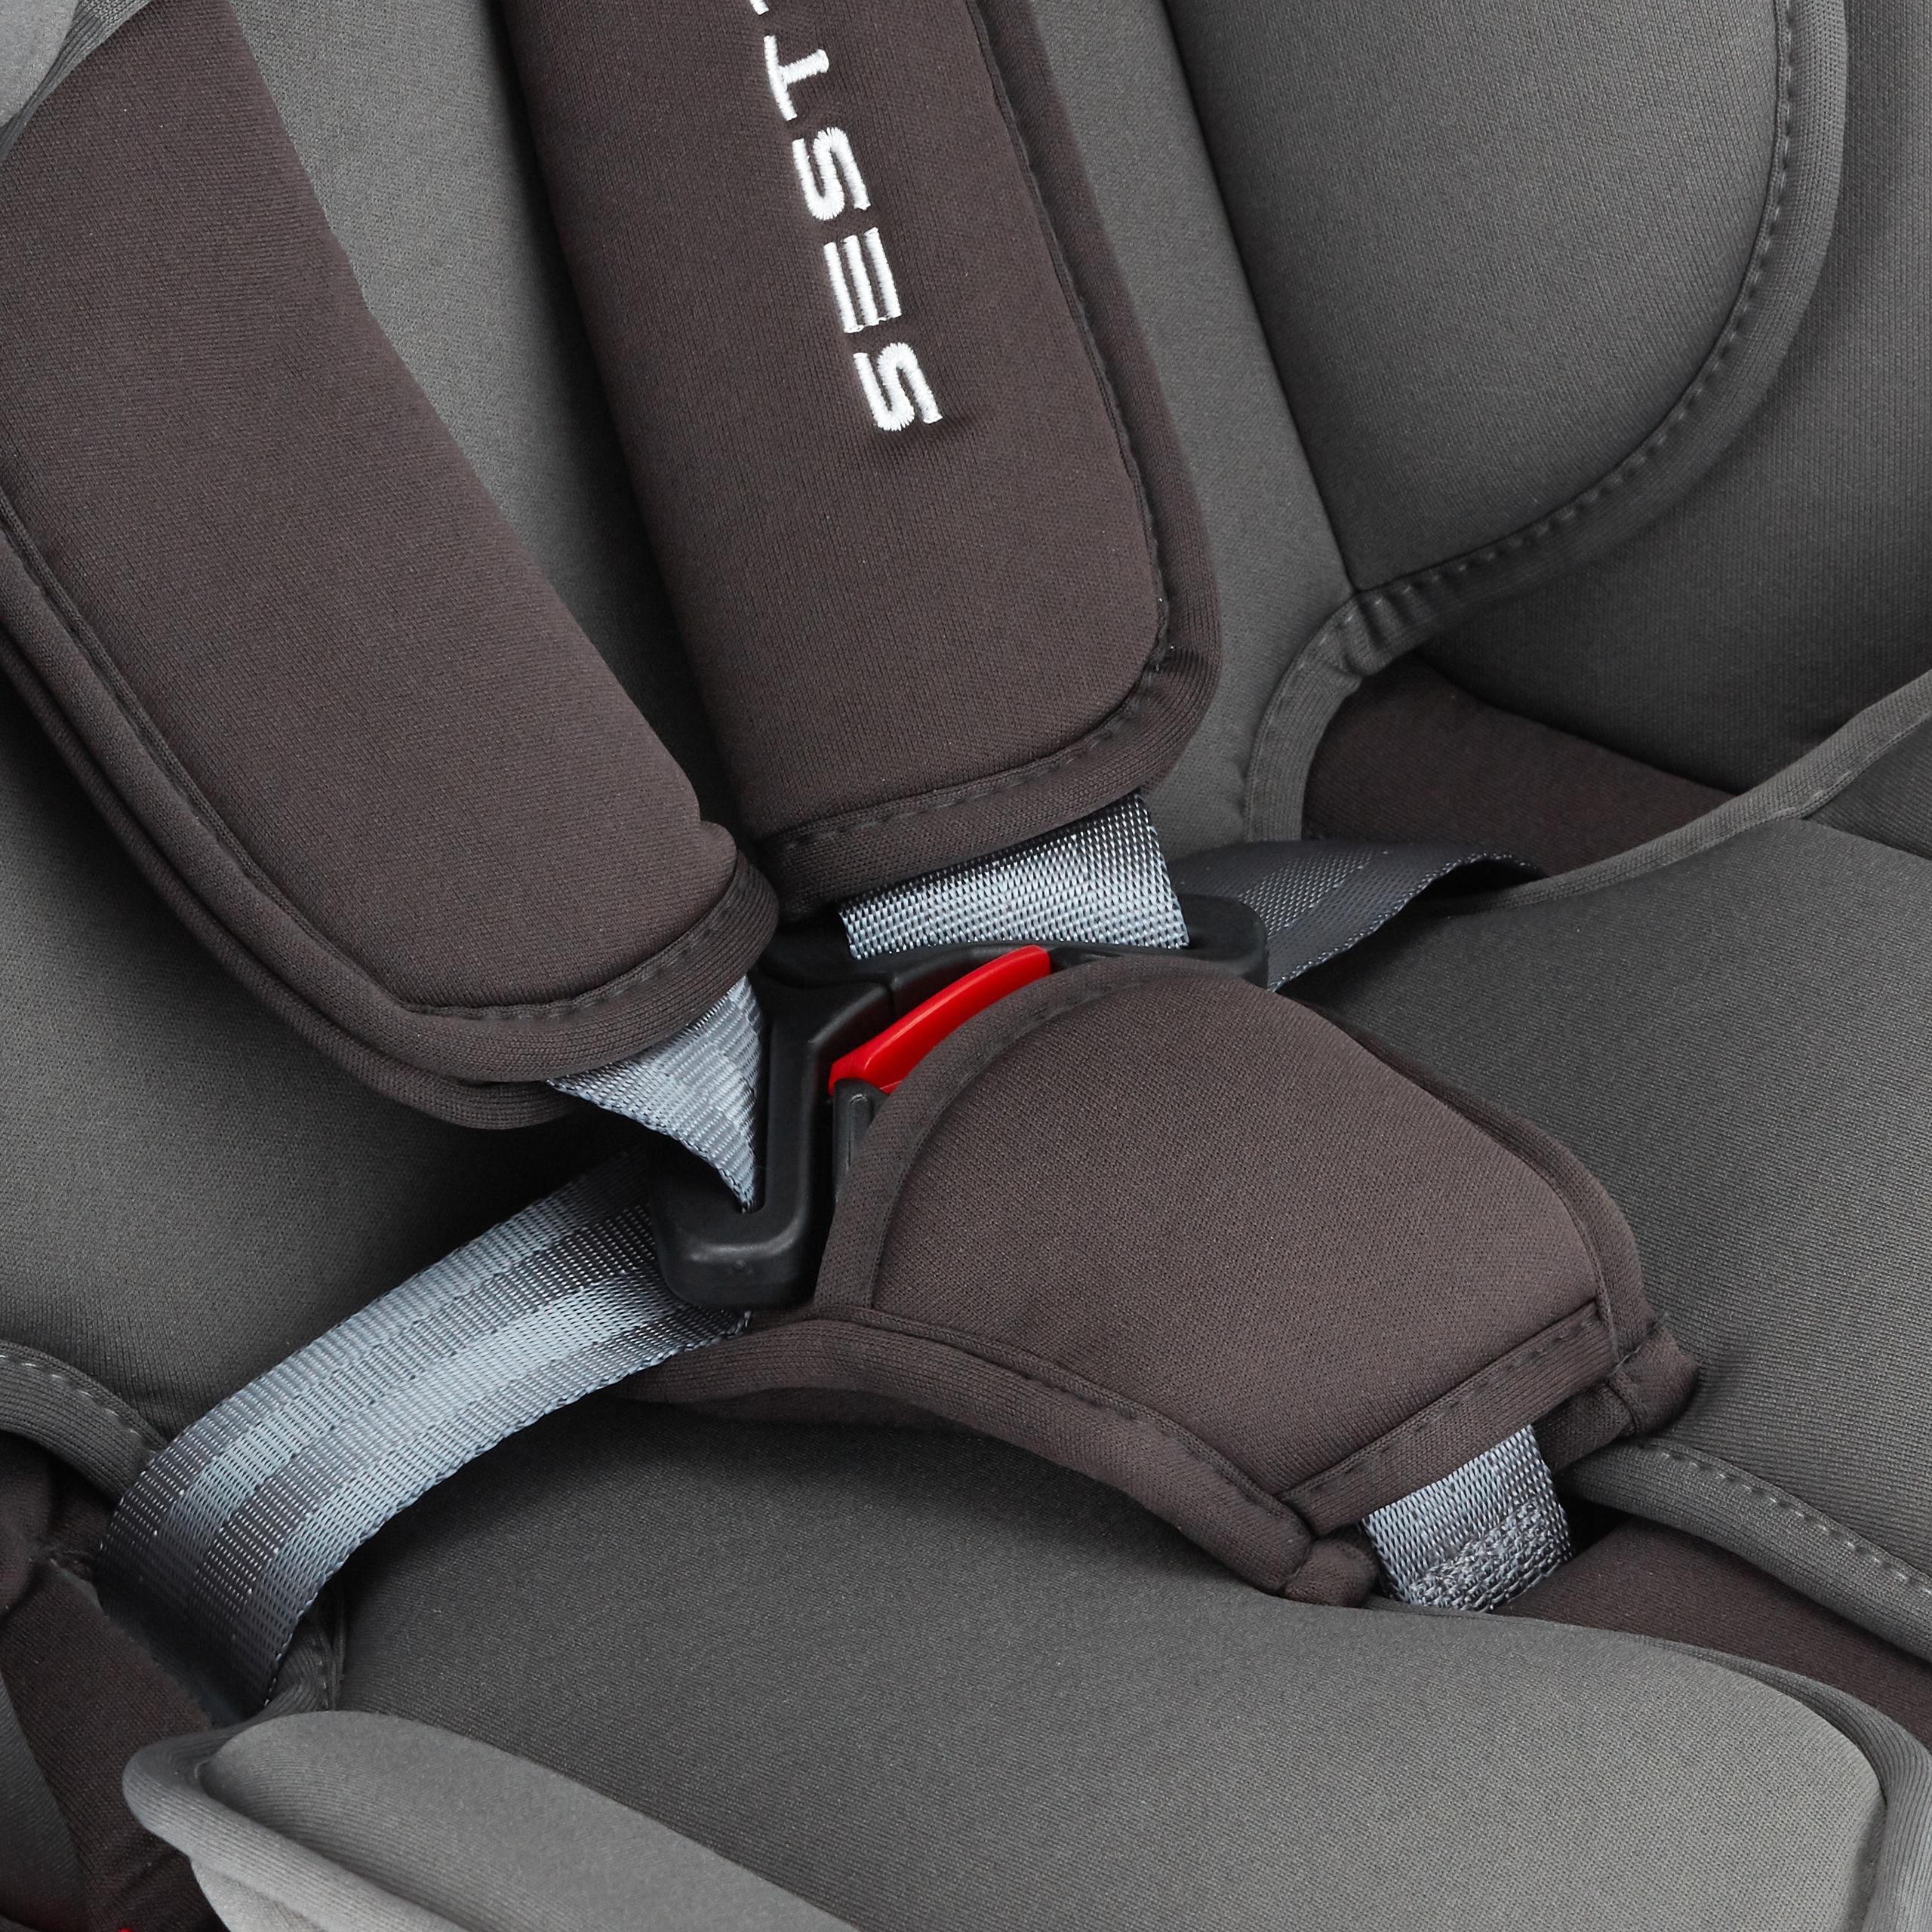 Fotelik samochodowy Sesttino Secure PRO 0-36kg Seria 1